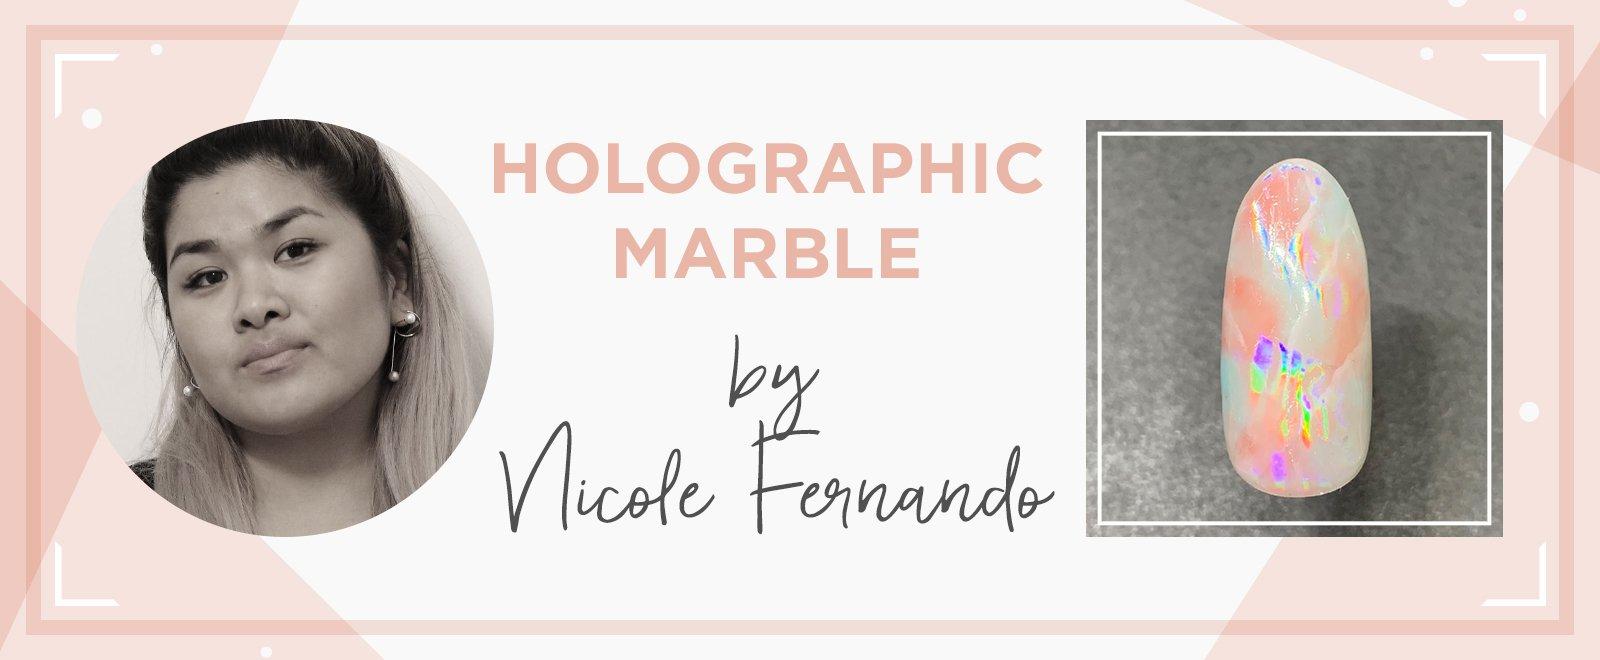 SBS_header_template_1600x660_holo-marble_Nicole-Fernando